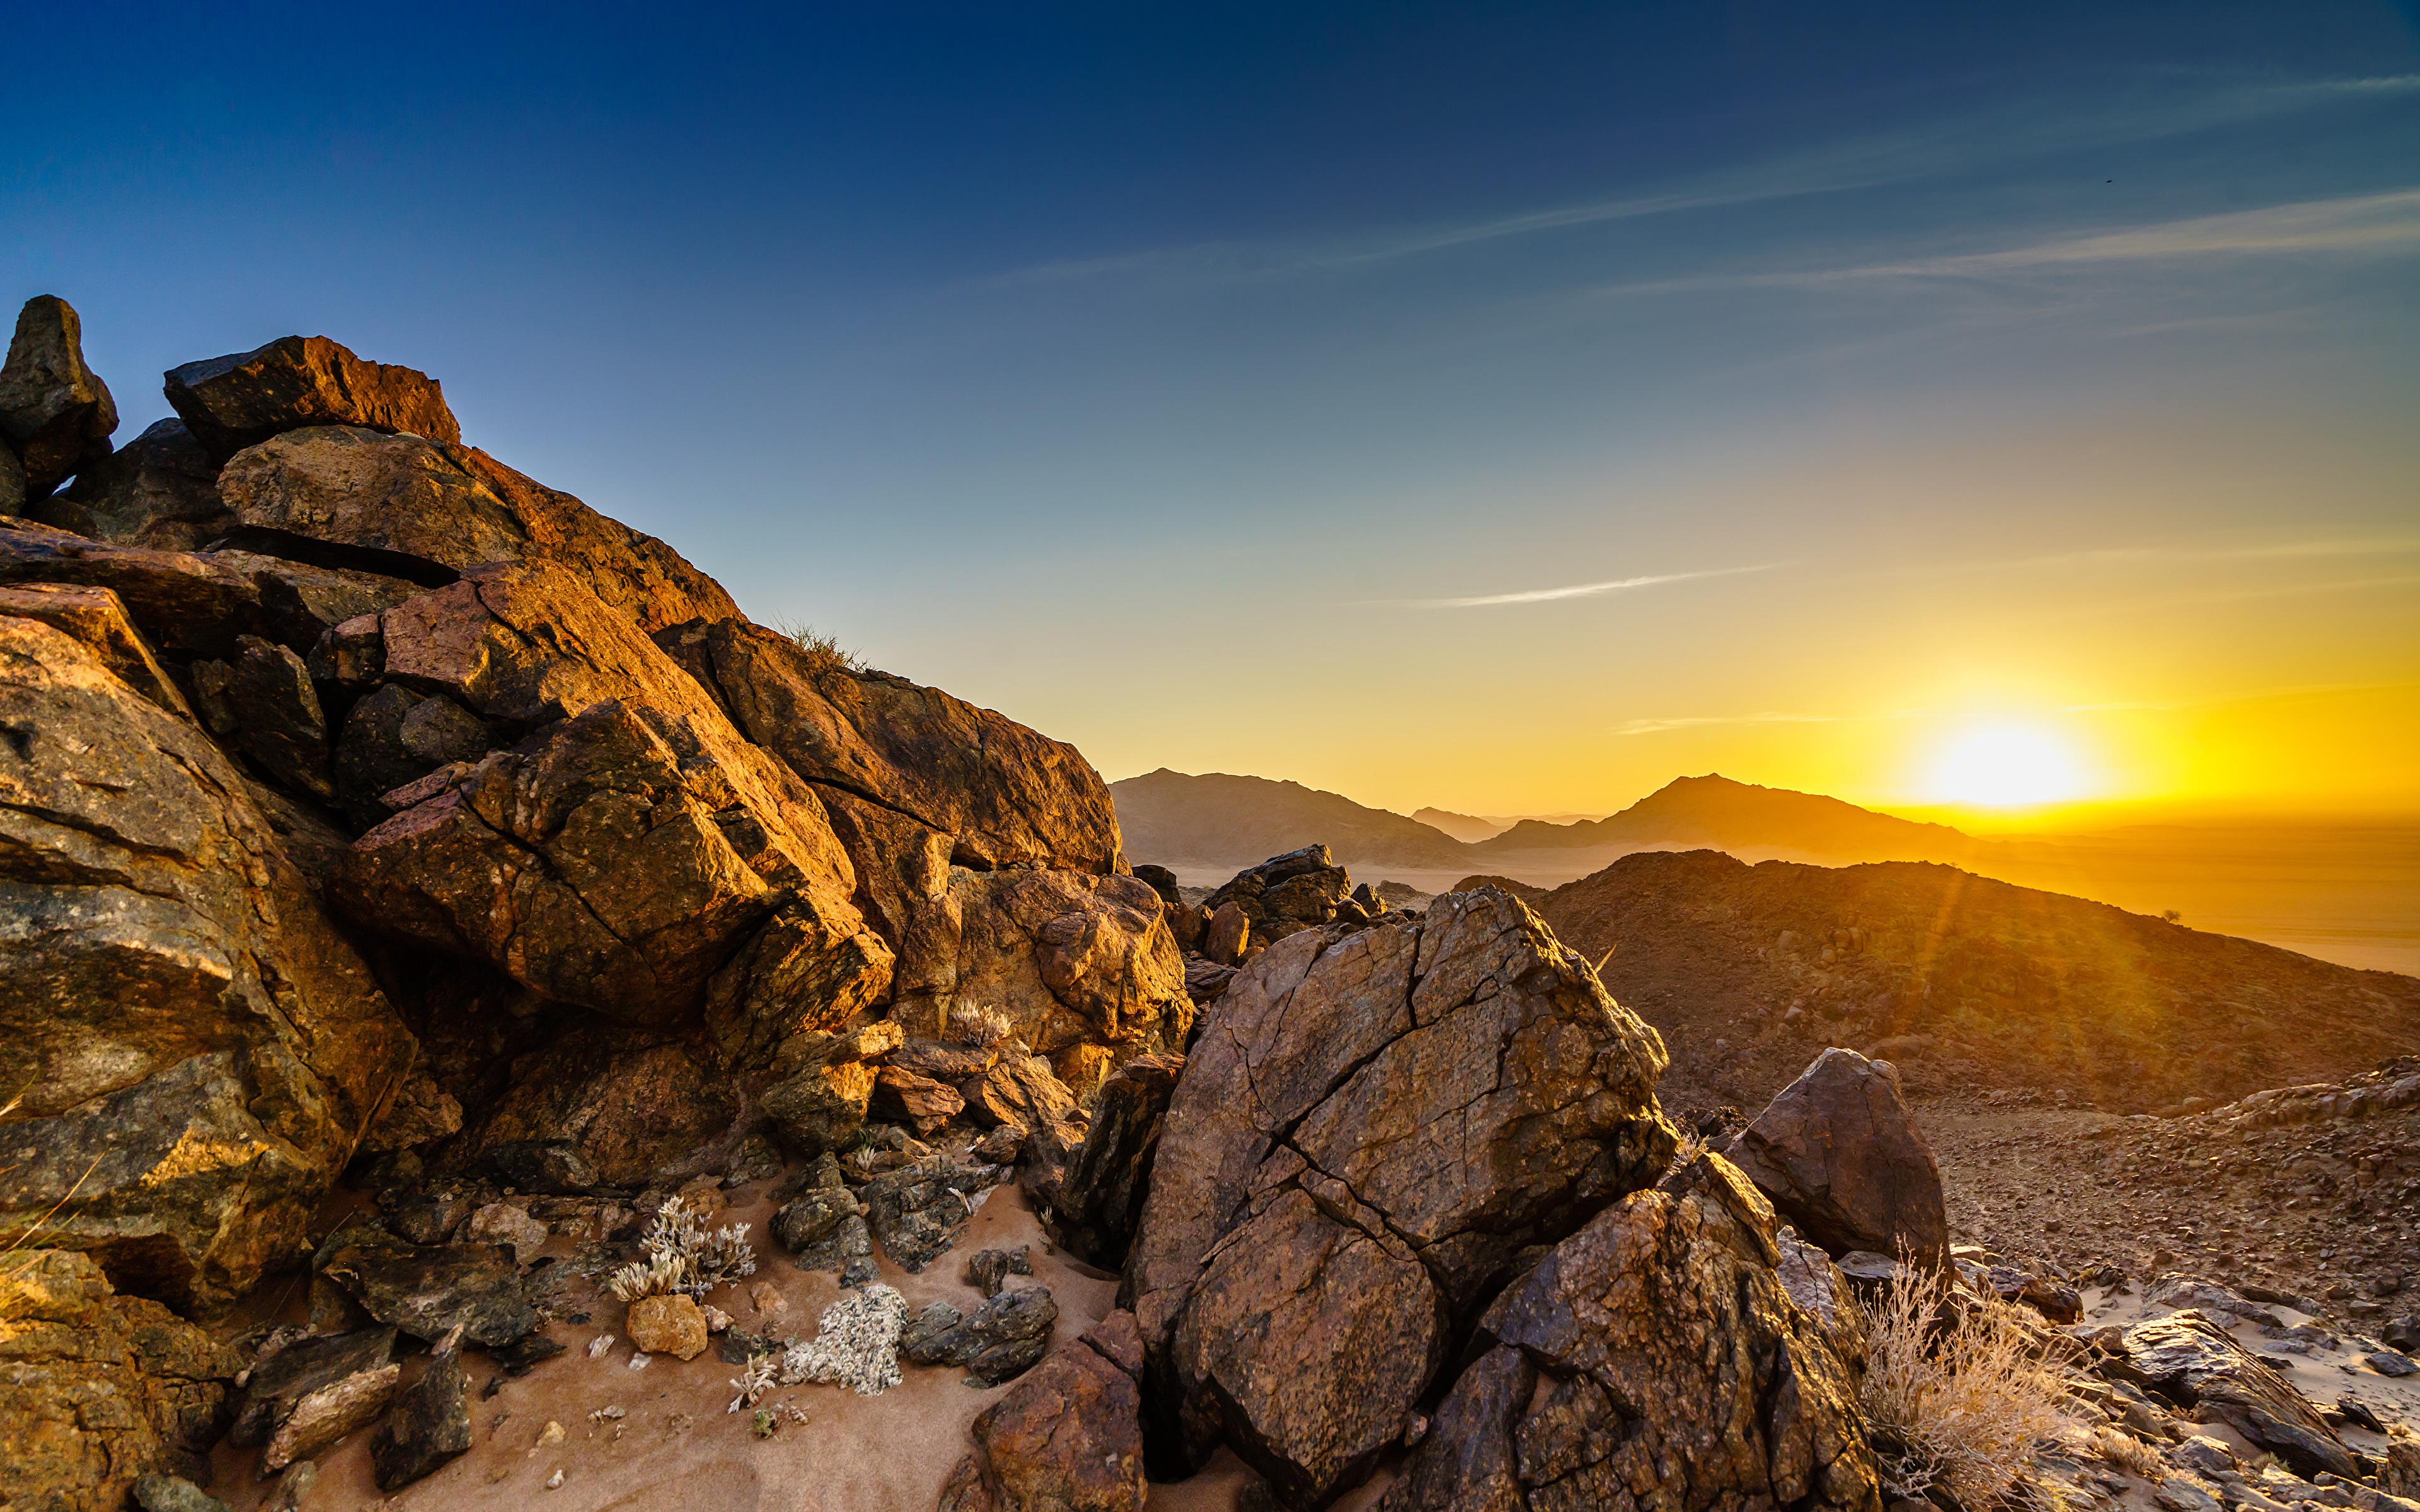 Картинки Африка Namib-Naukluft National Park, Namibia скале Природа рассвет и закат Камни 3840x2400 Утес Скала скалы Рассветы и закаты Камень